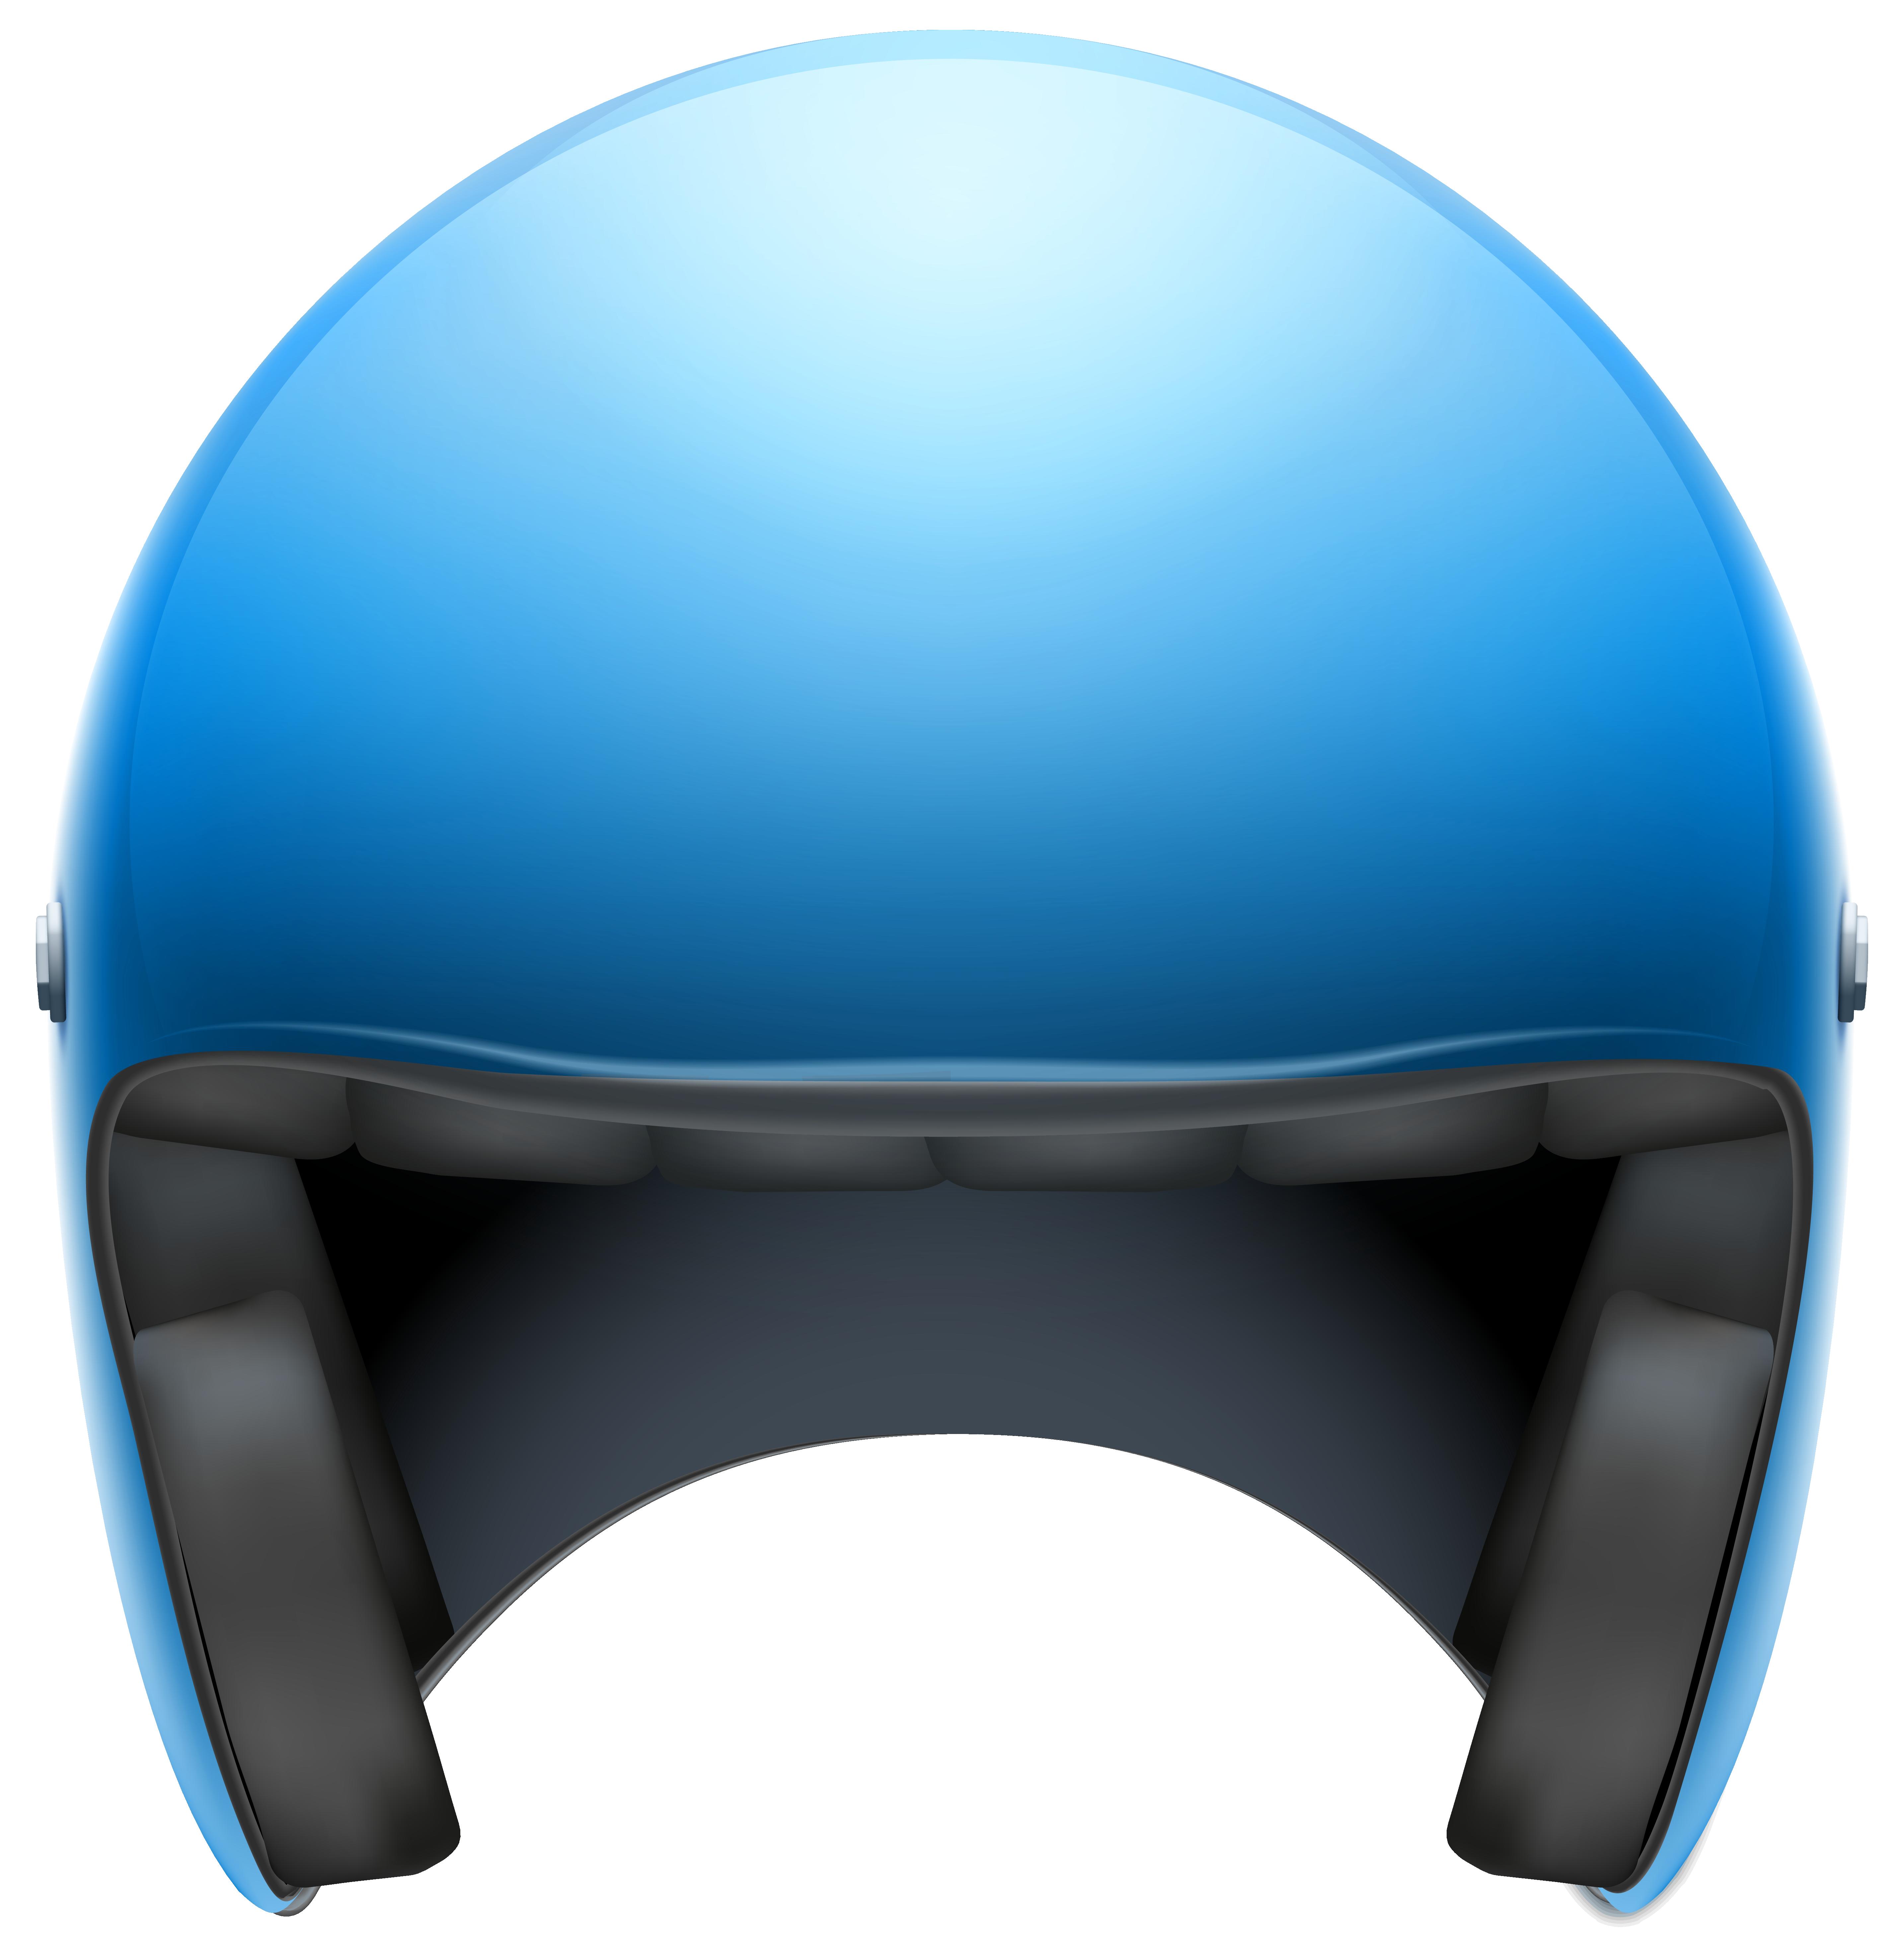 Blue clipart image gallery. Helmet png